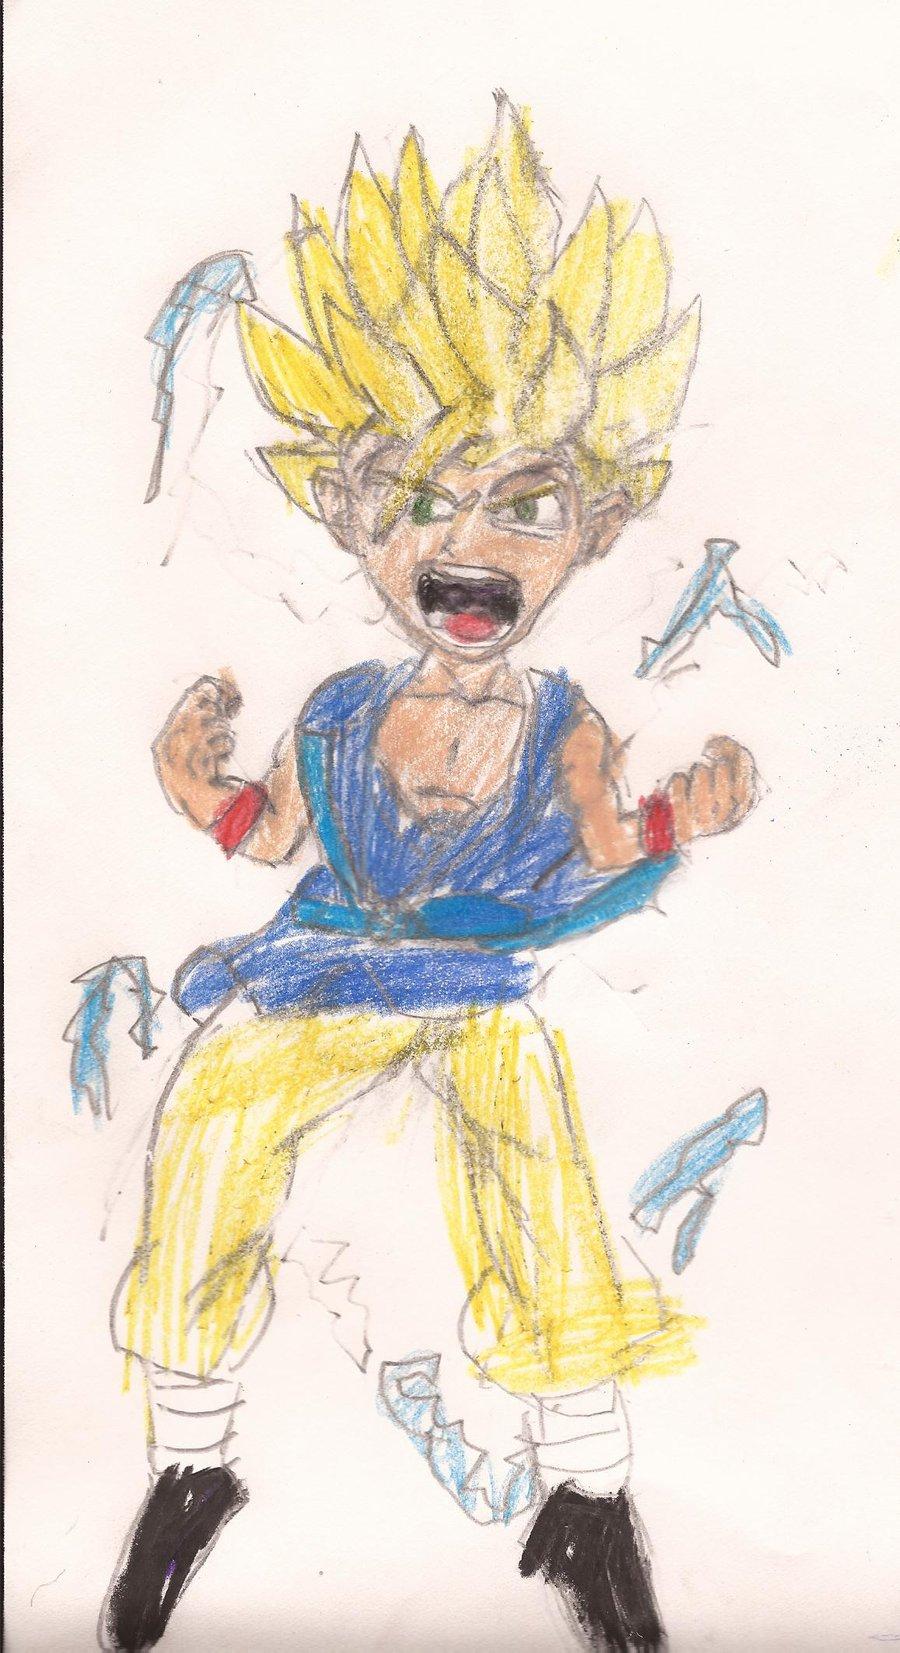 900x1653 Drawing Dragon Ball Gt Goku Super Saiyan 2 Dragon Ball Gt